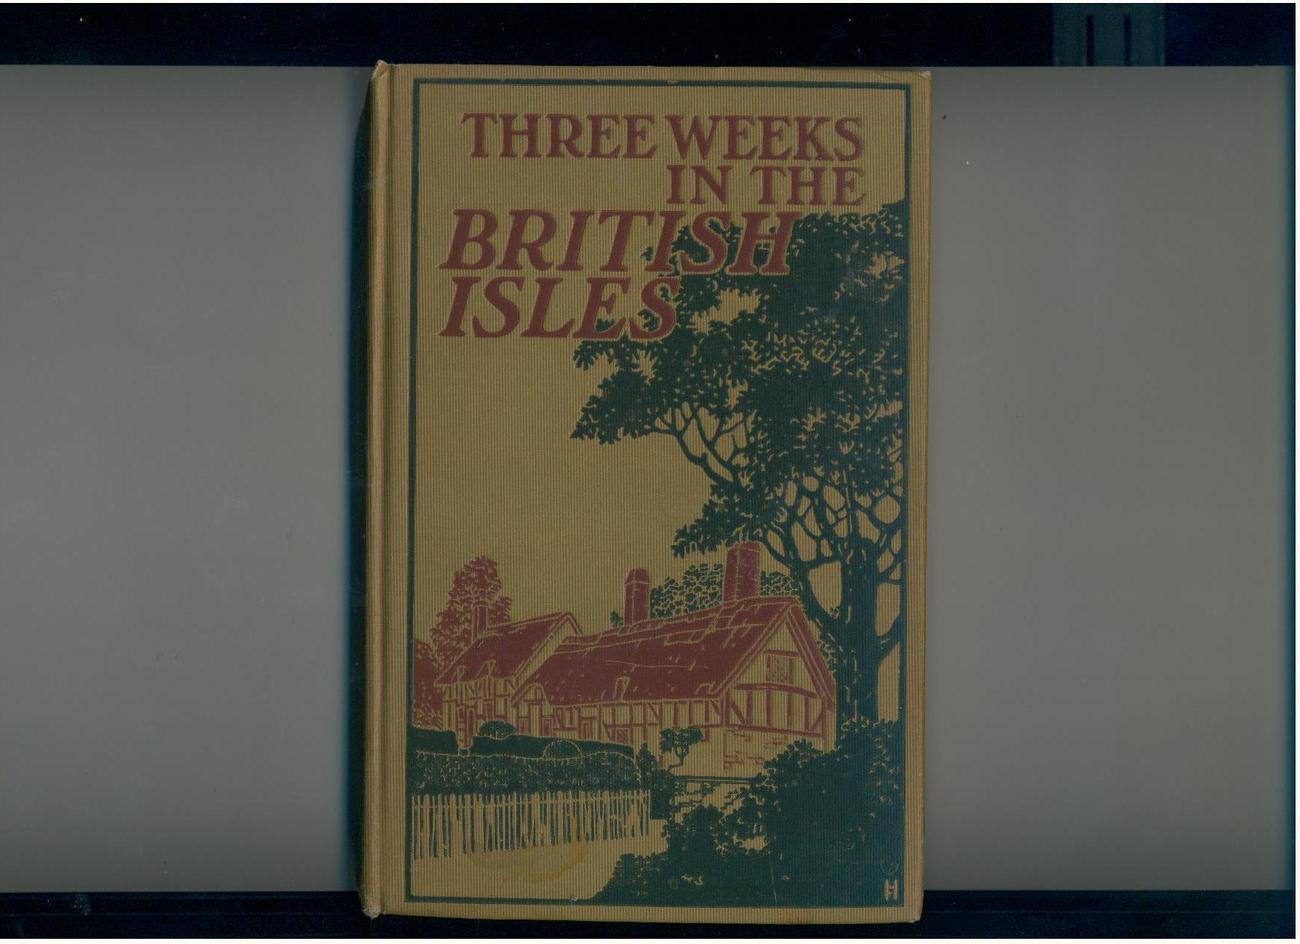 Higinbotham--3 WEEKS IN BRITISH ISLES--1911--illustrated